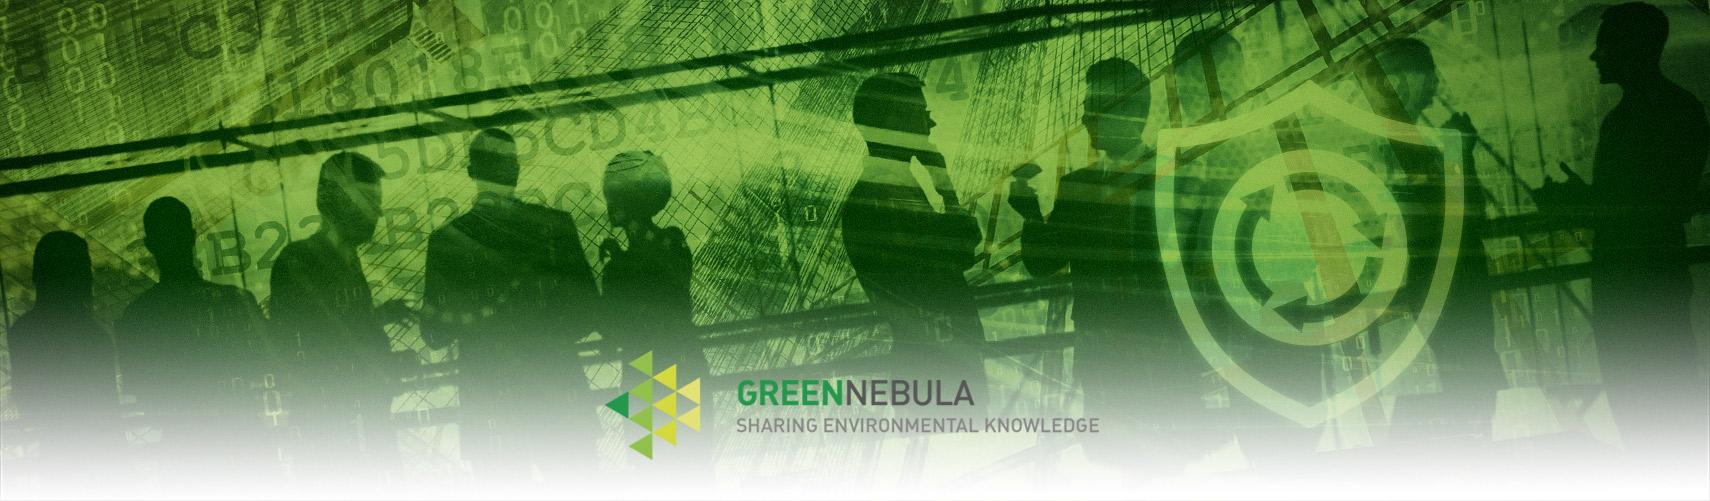 responsabilita-ambientale-imprese